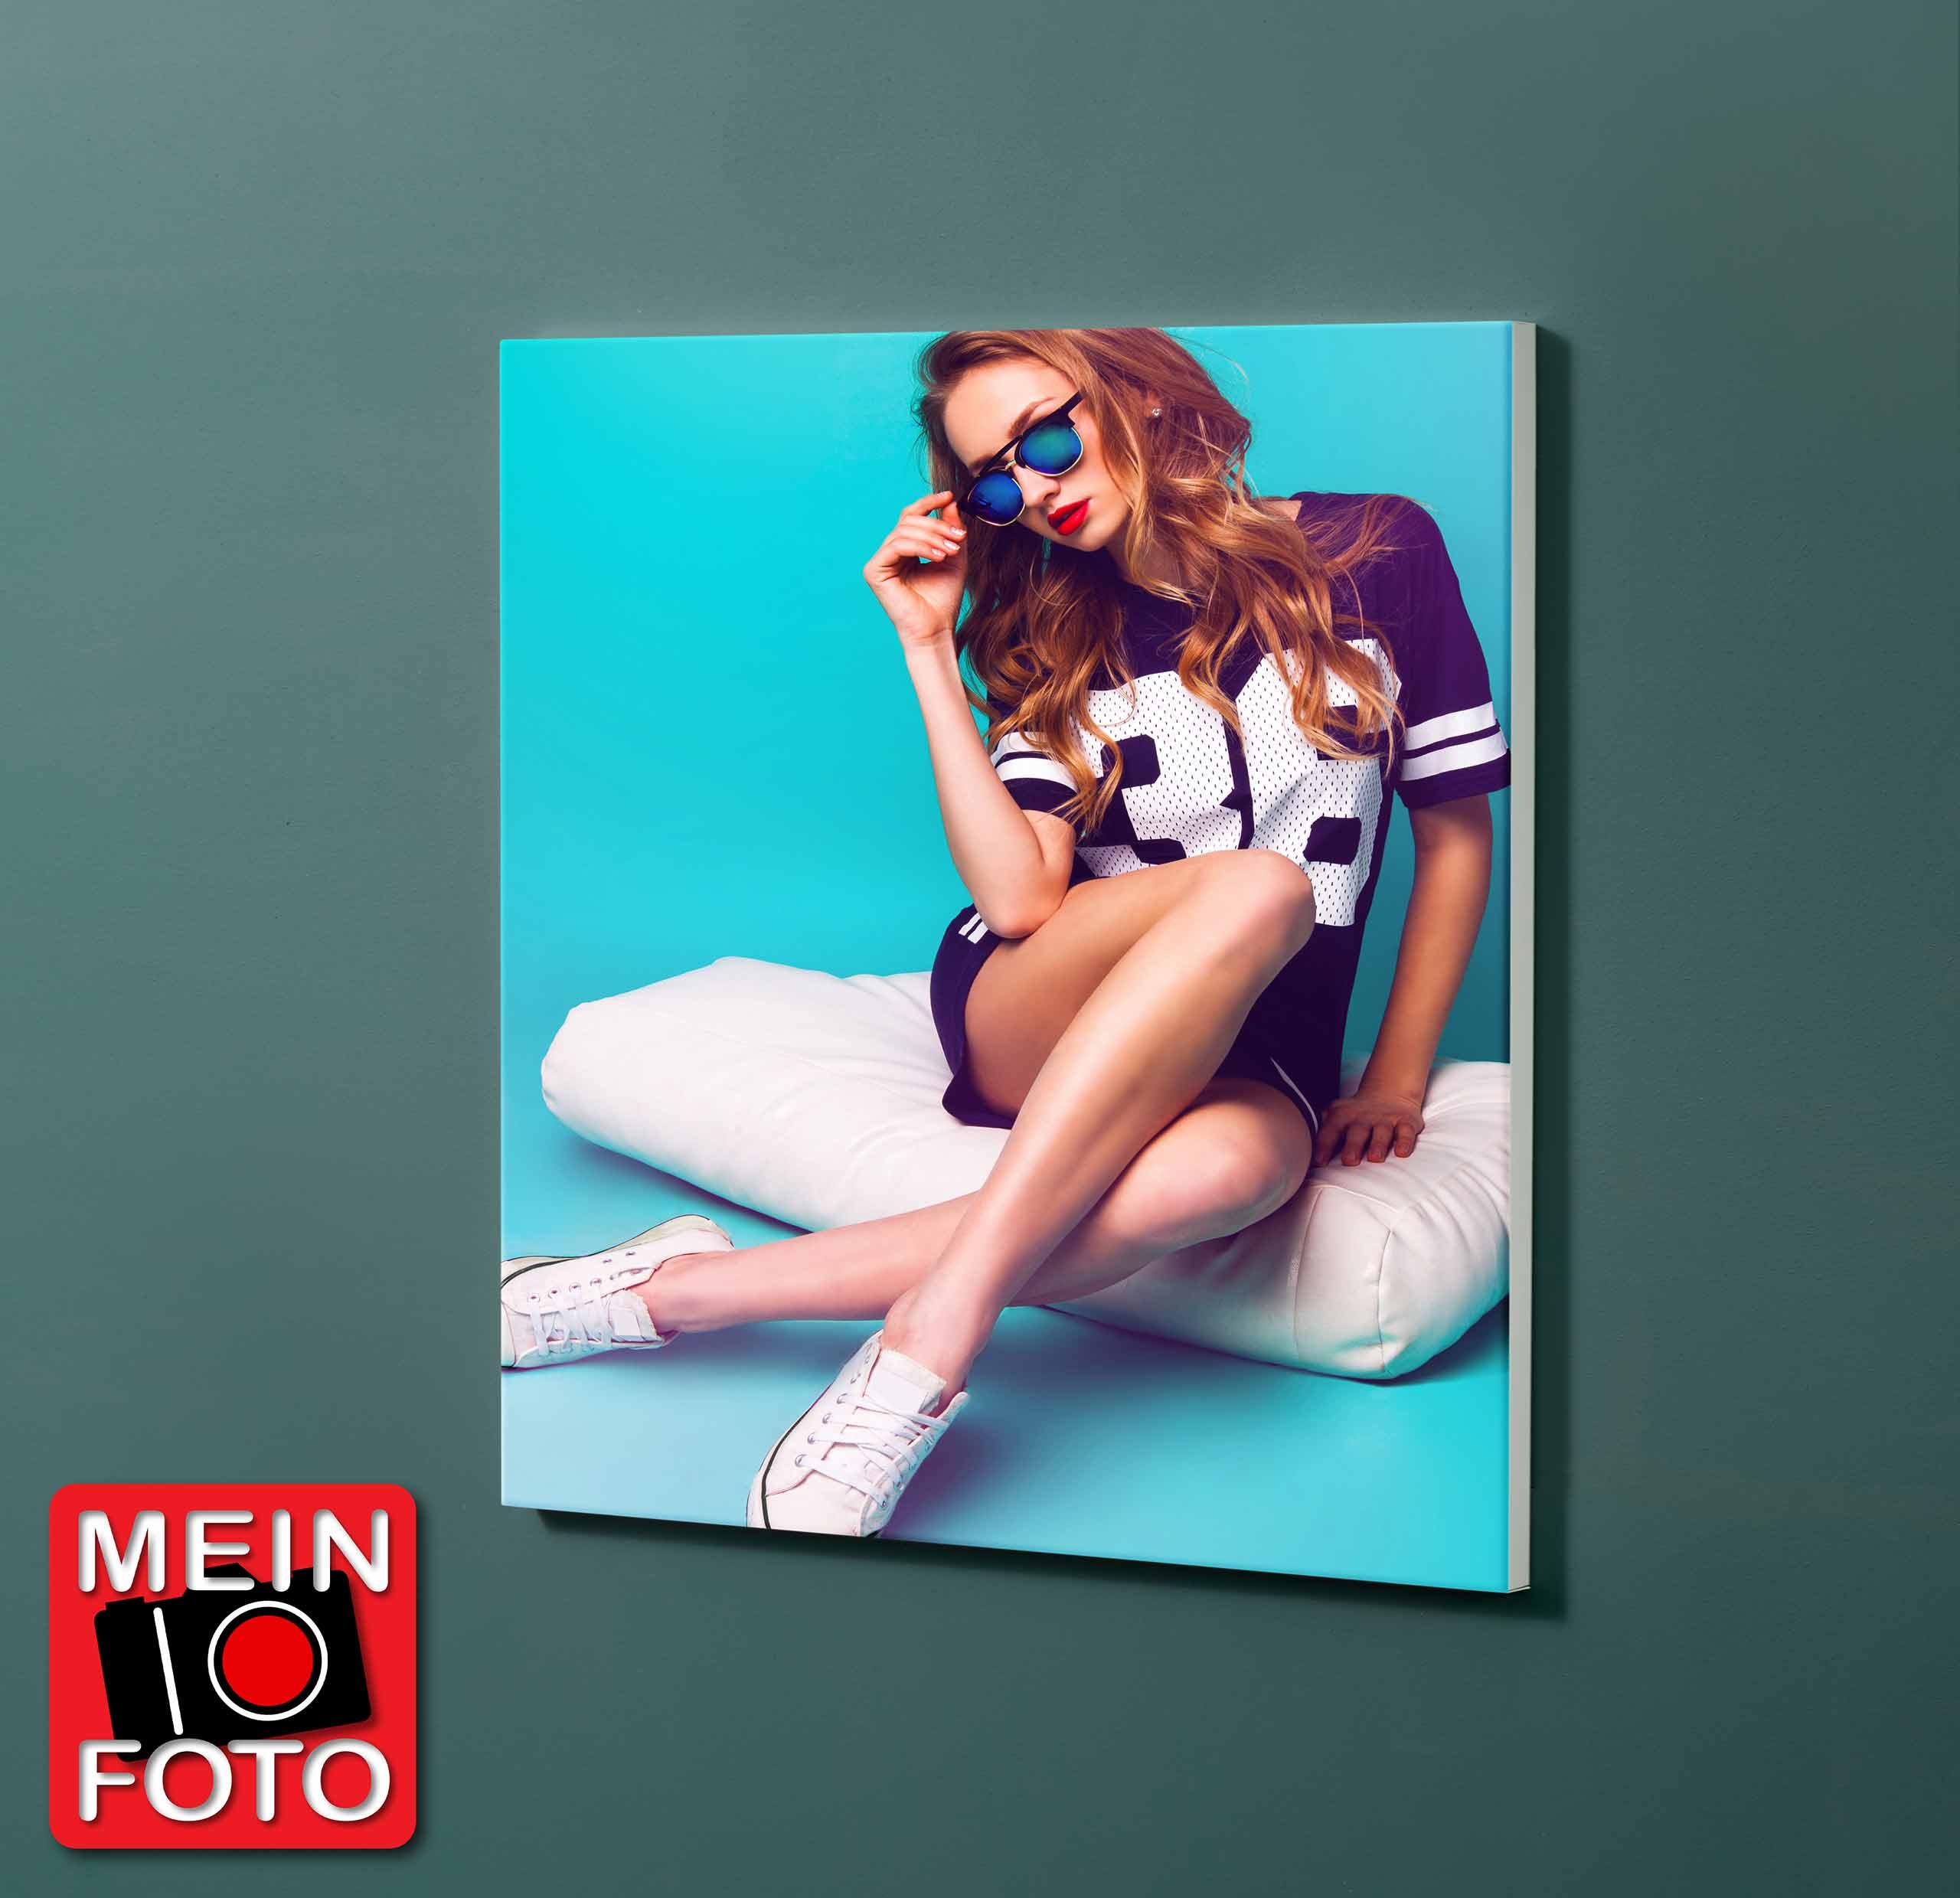 "Magnettafel NOTIZ 60x60cm Motiv-Pinnwand ""Mein Foto"""